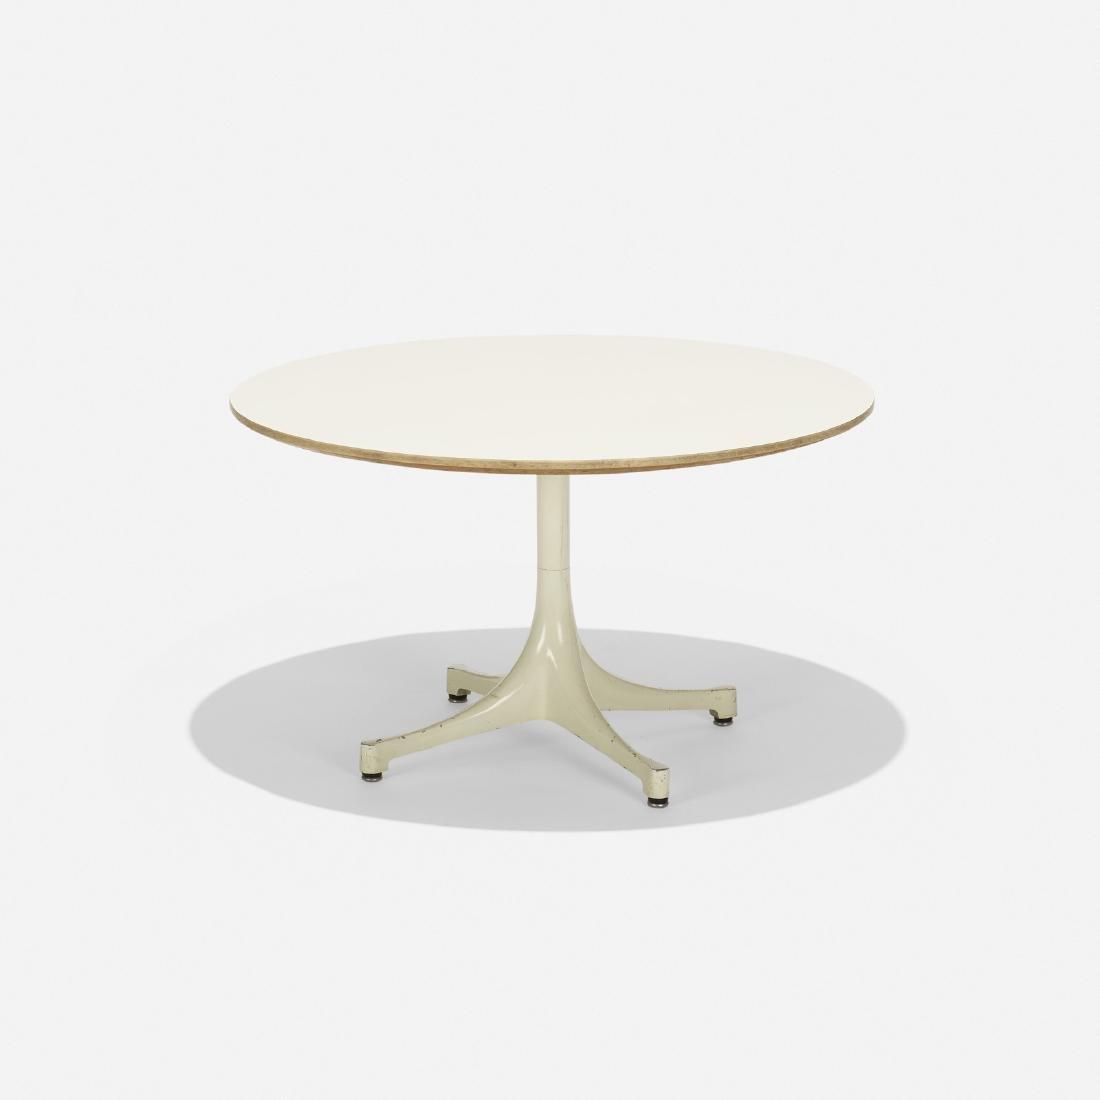 George Nelson & Associates, coffee table, model 5452